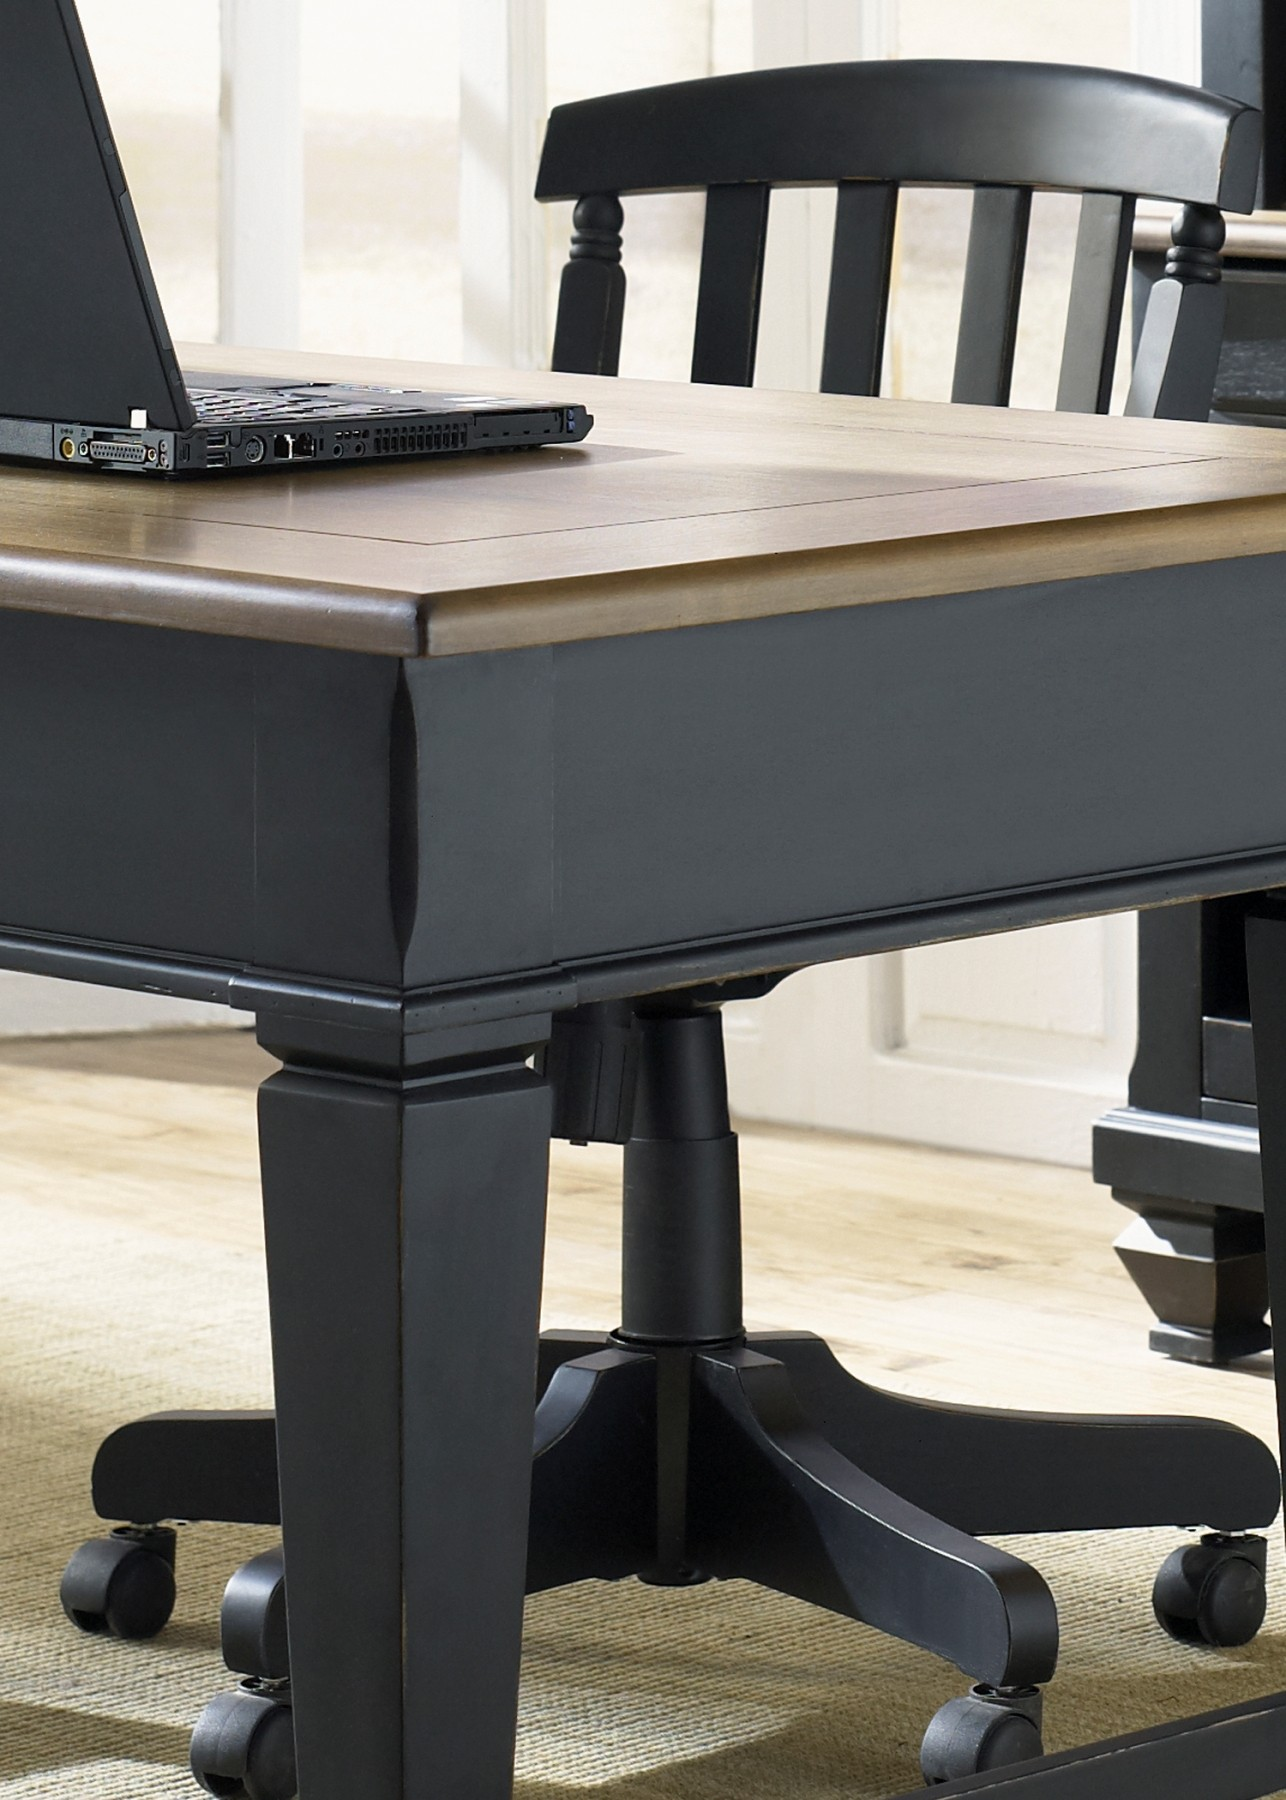 Bungalow Ii Black Jr Executive Desk From Liberty 641